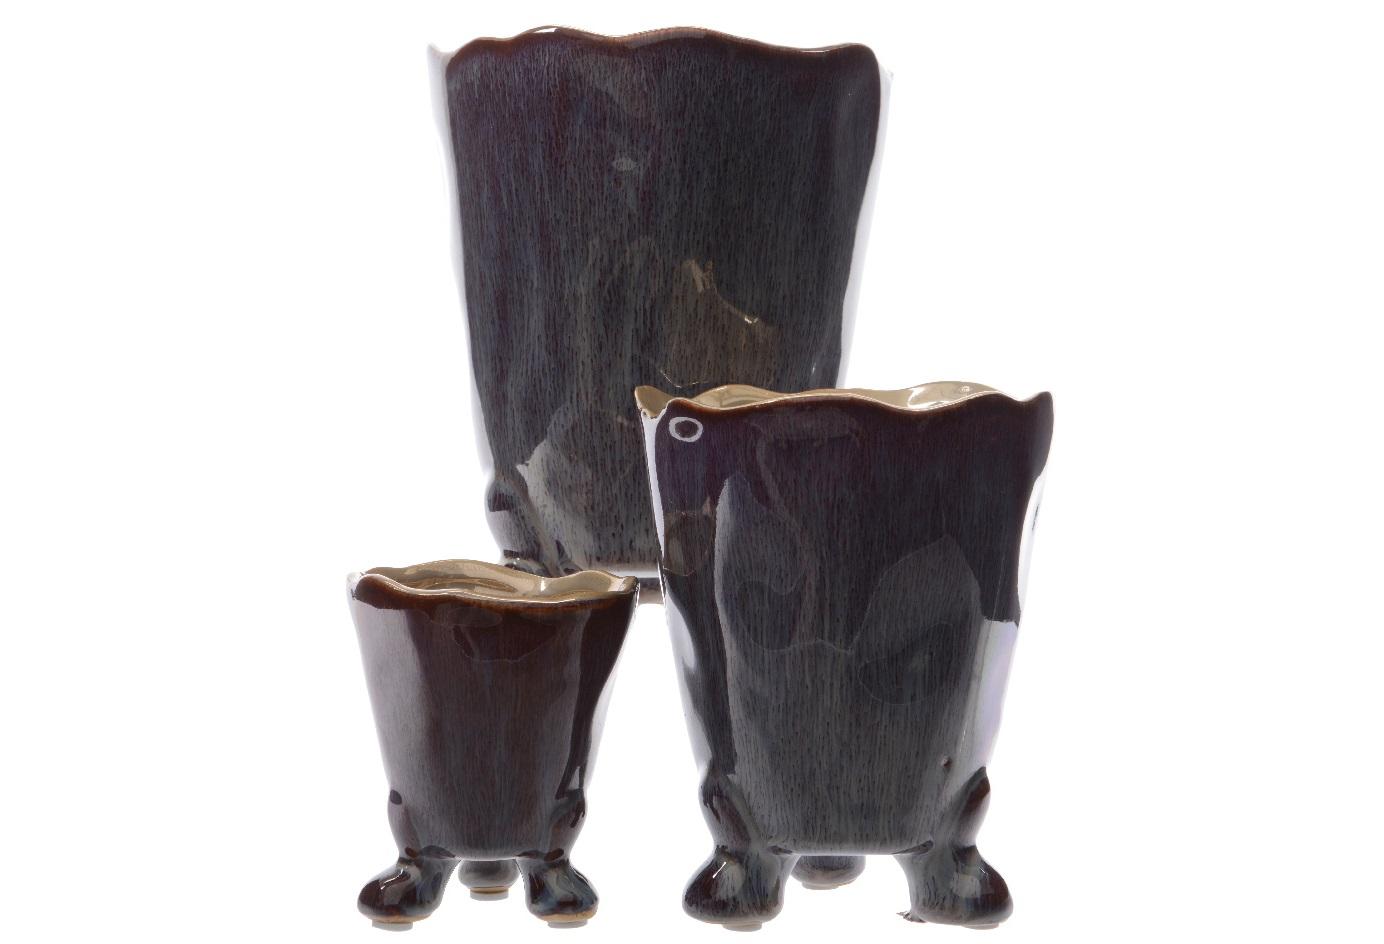 Сет вазонов на ножках (3шт)